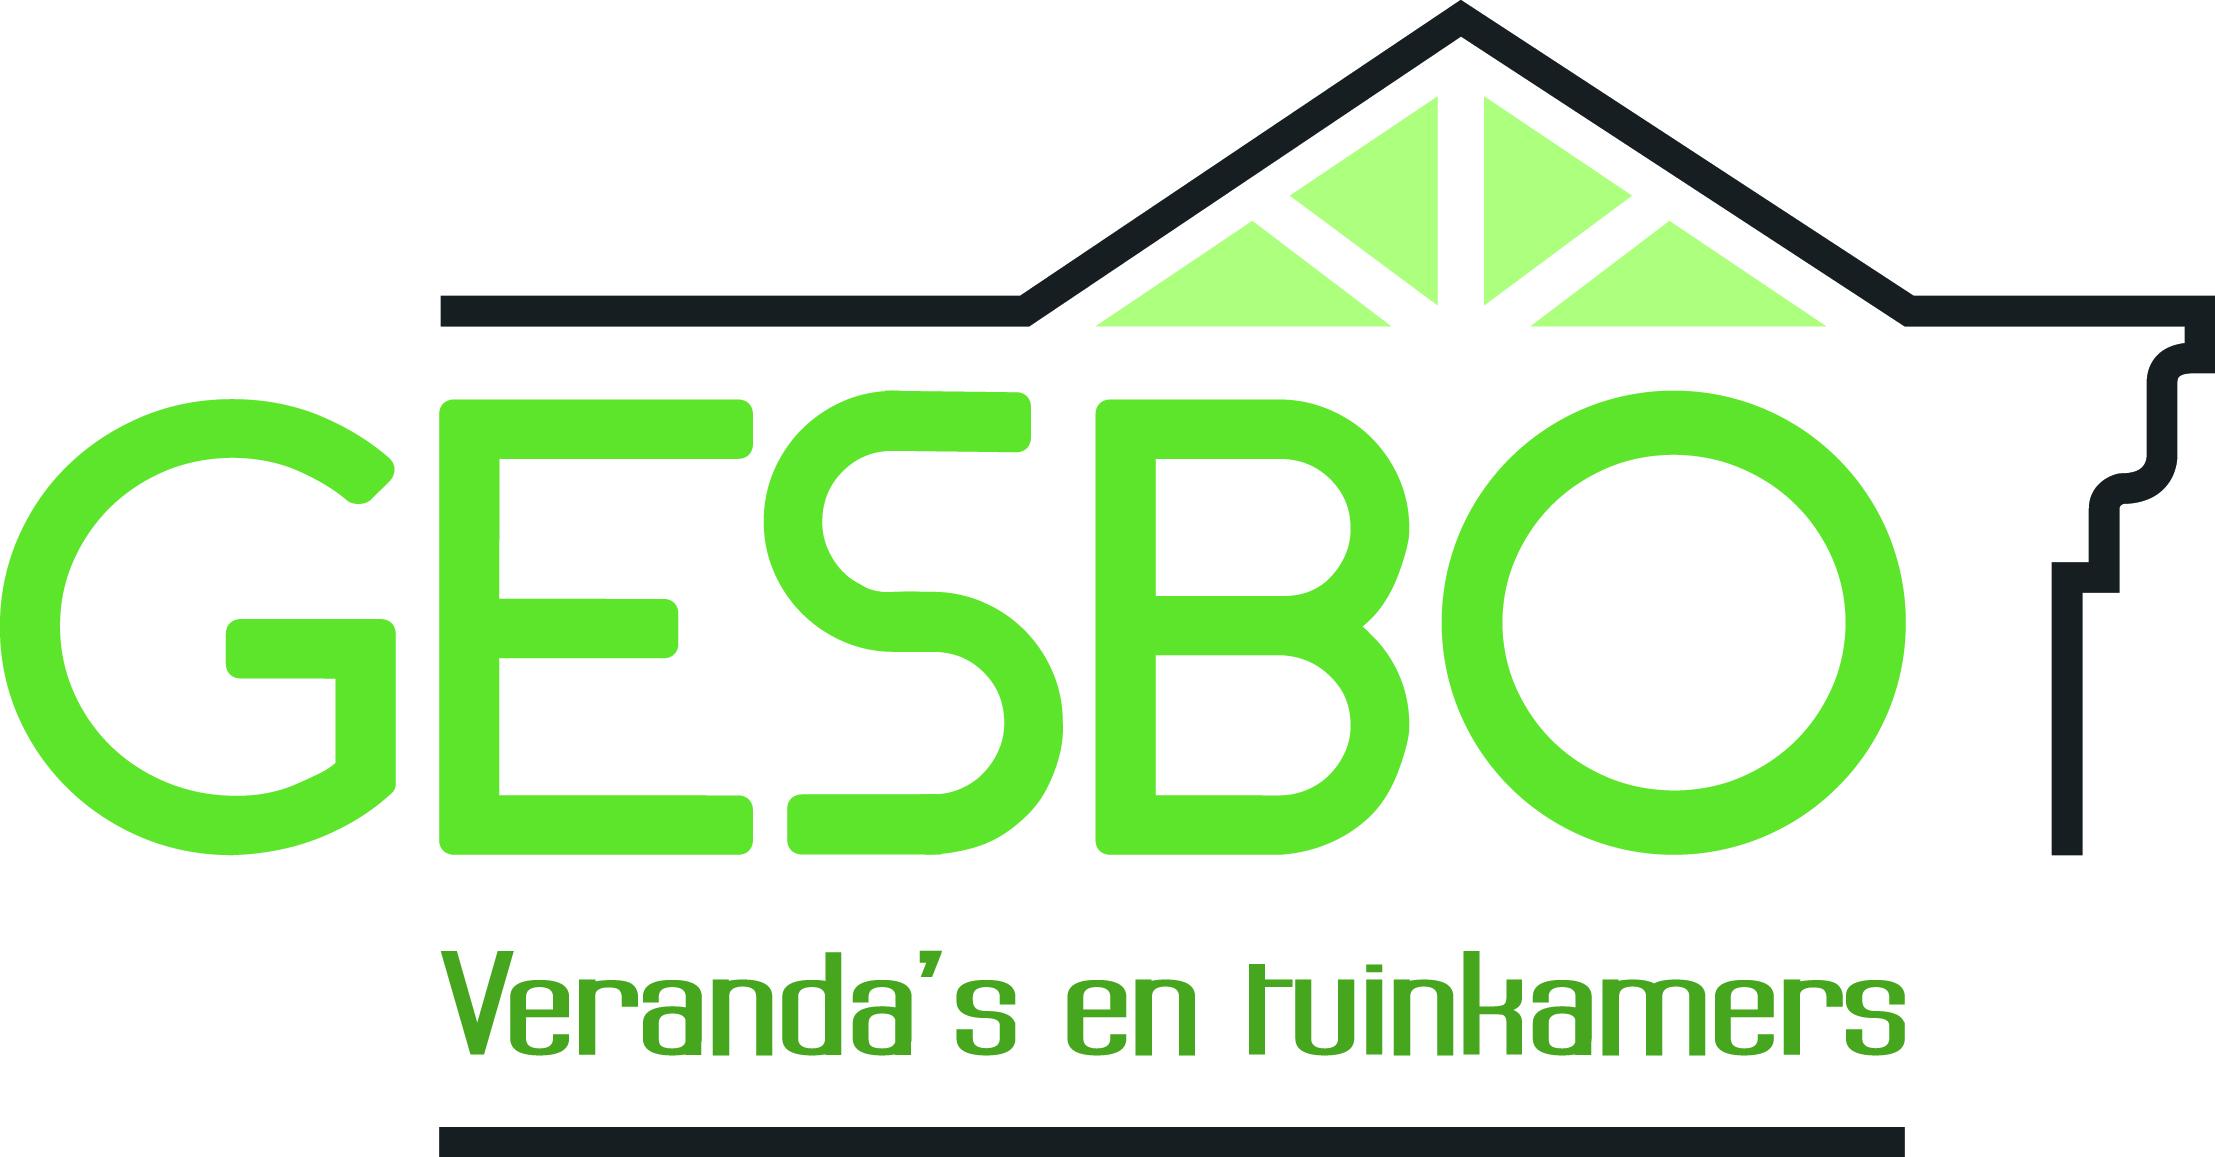 gesbo-verandas-logo